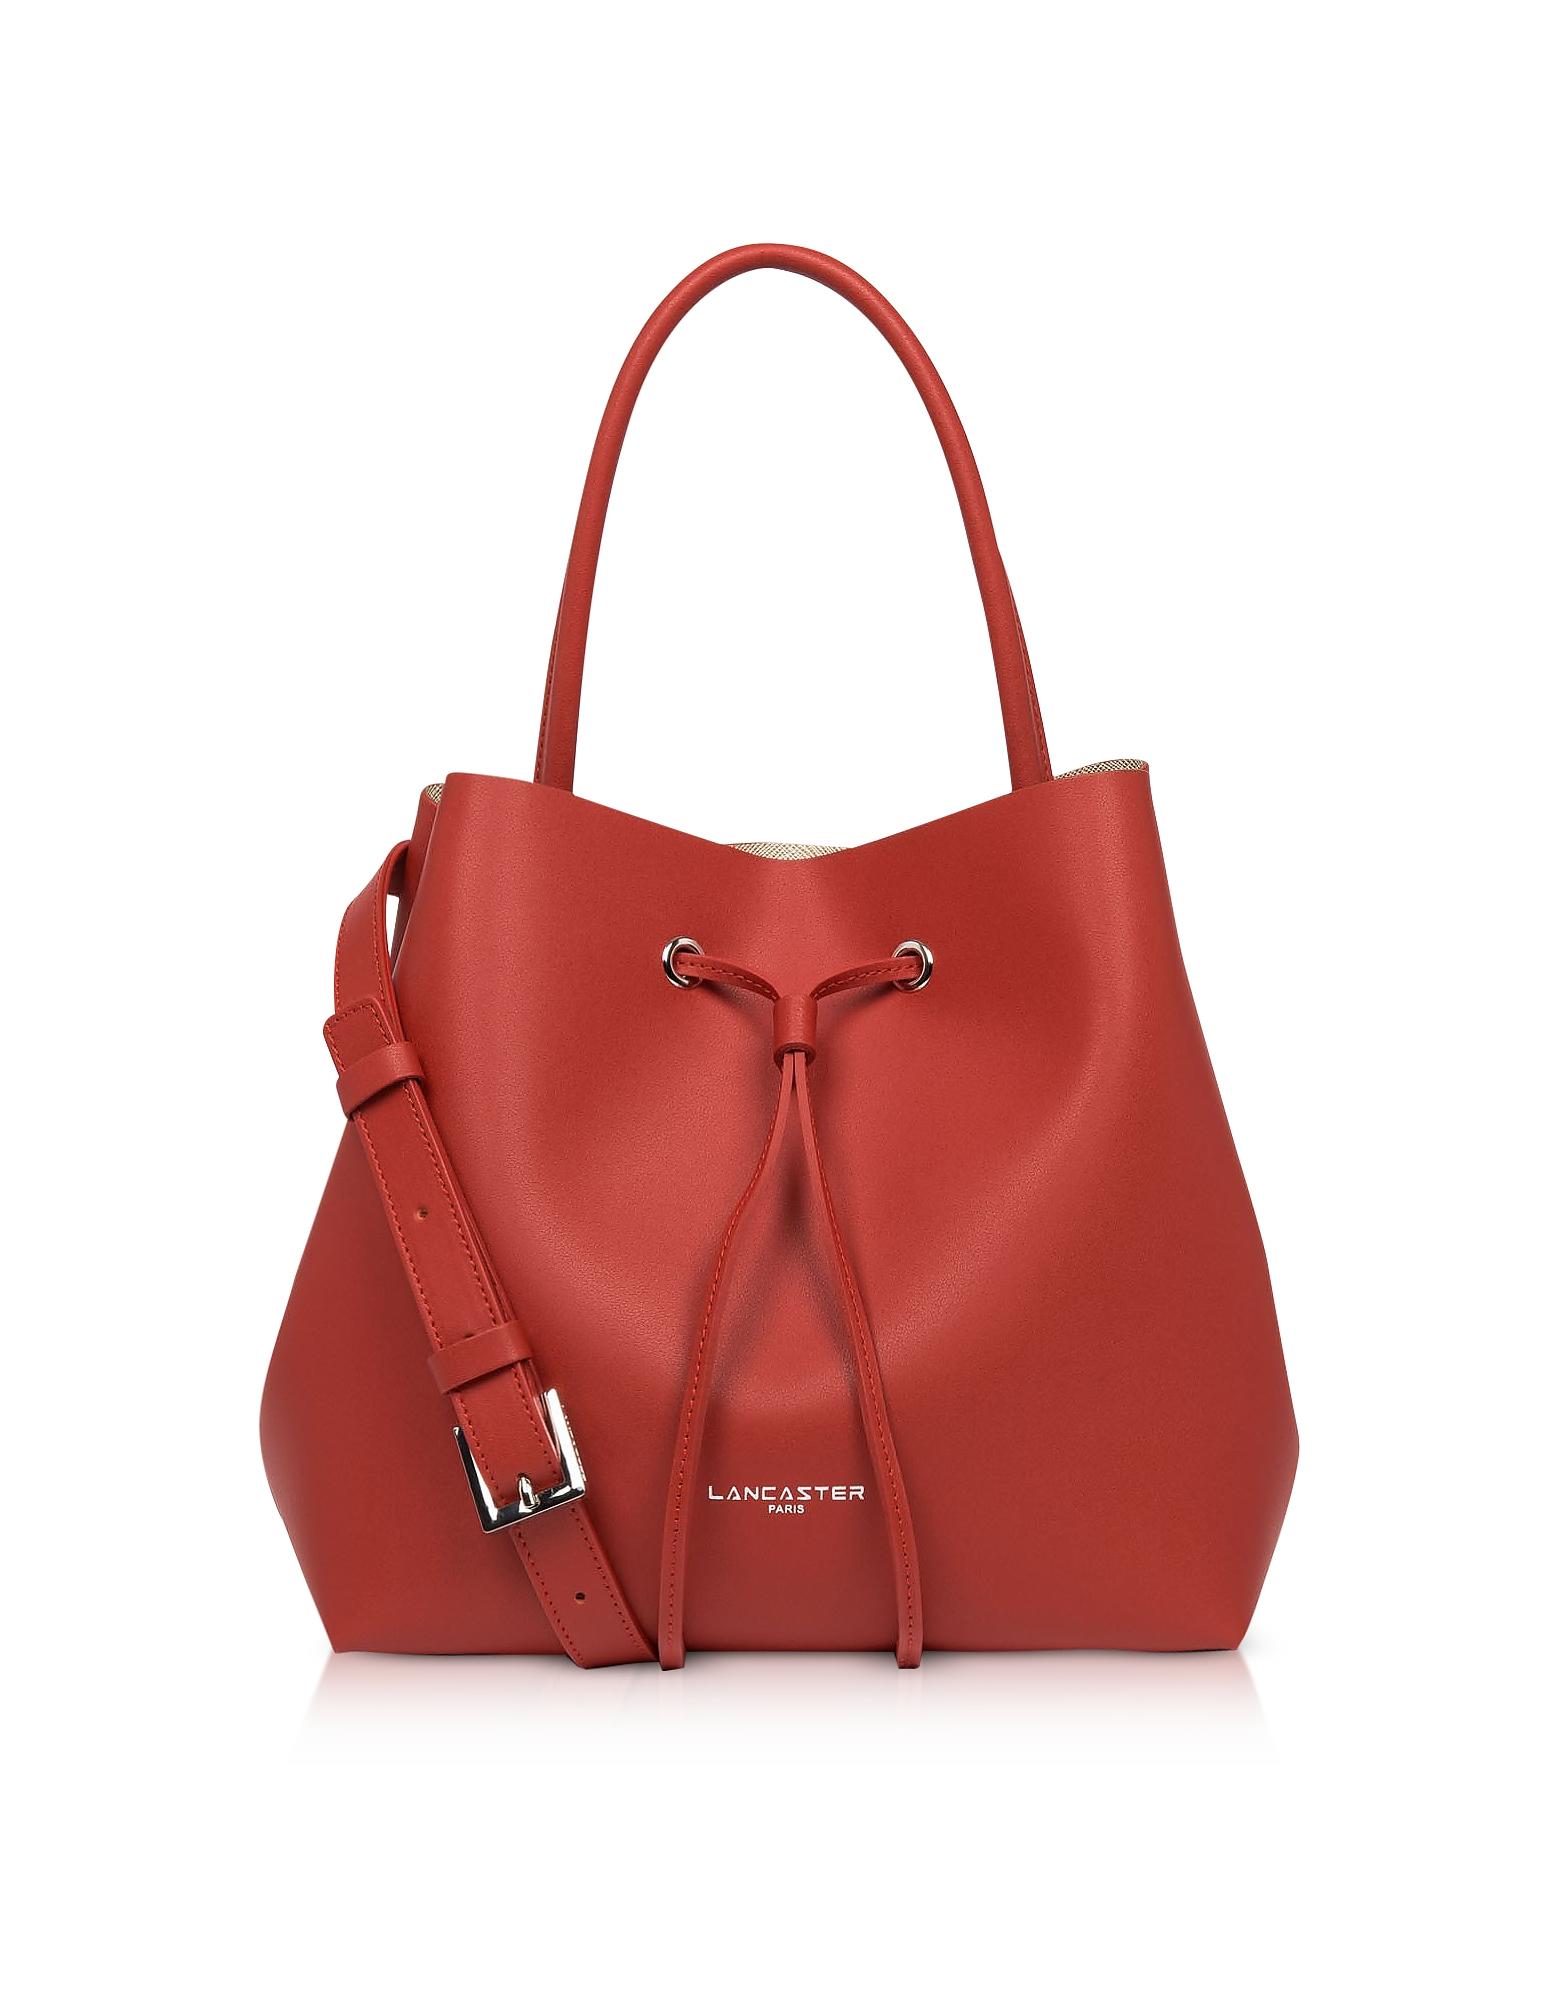 Lancaster Paris Designer Handbags, Pur & Element City Bucket Bag